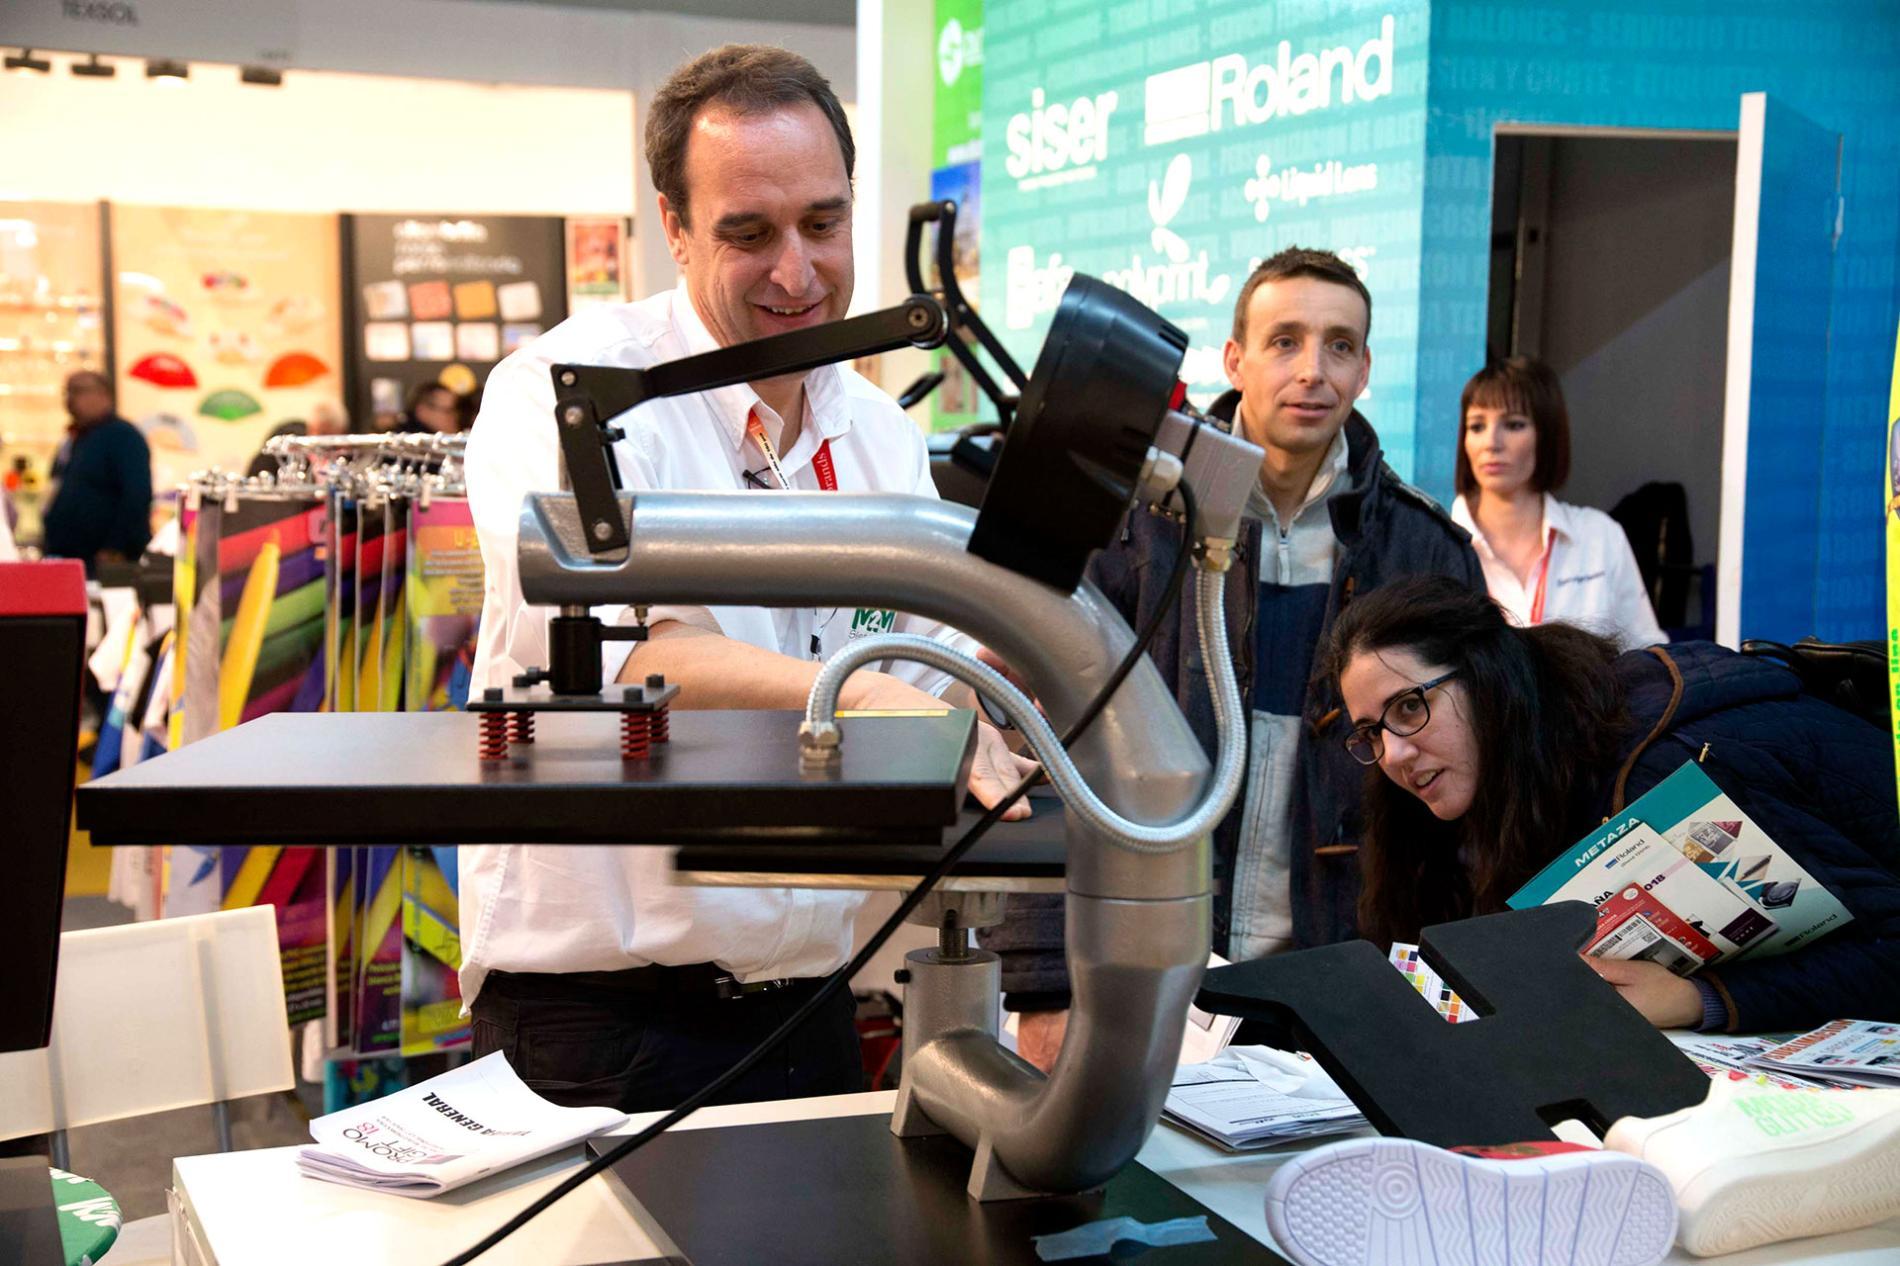 Exhibitor showing his textile printing machine